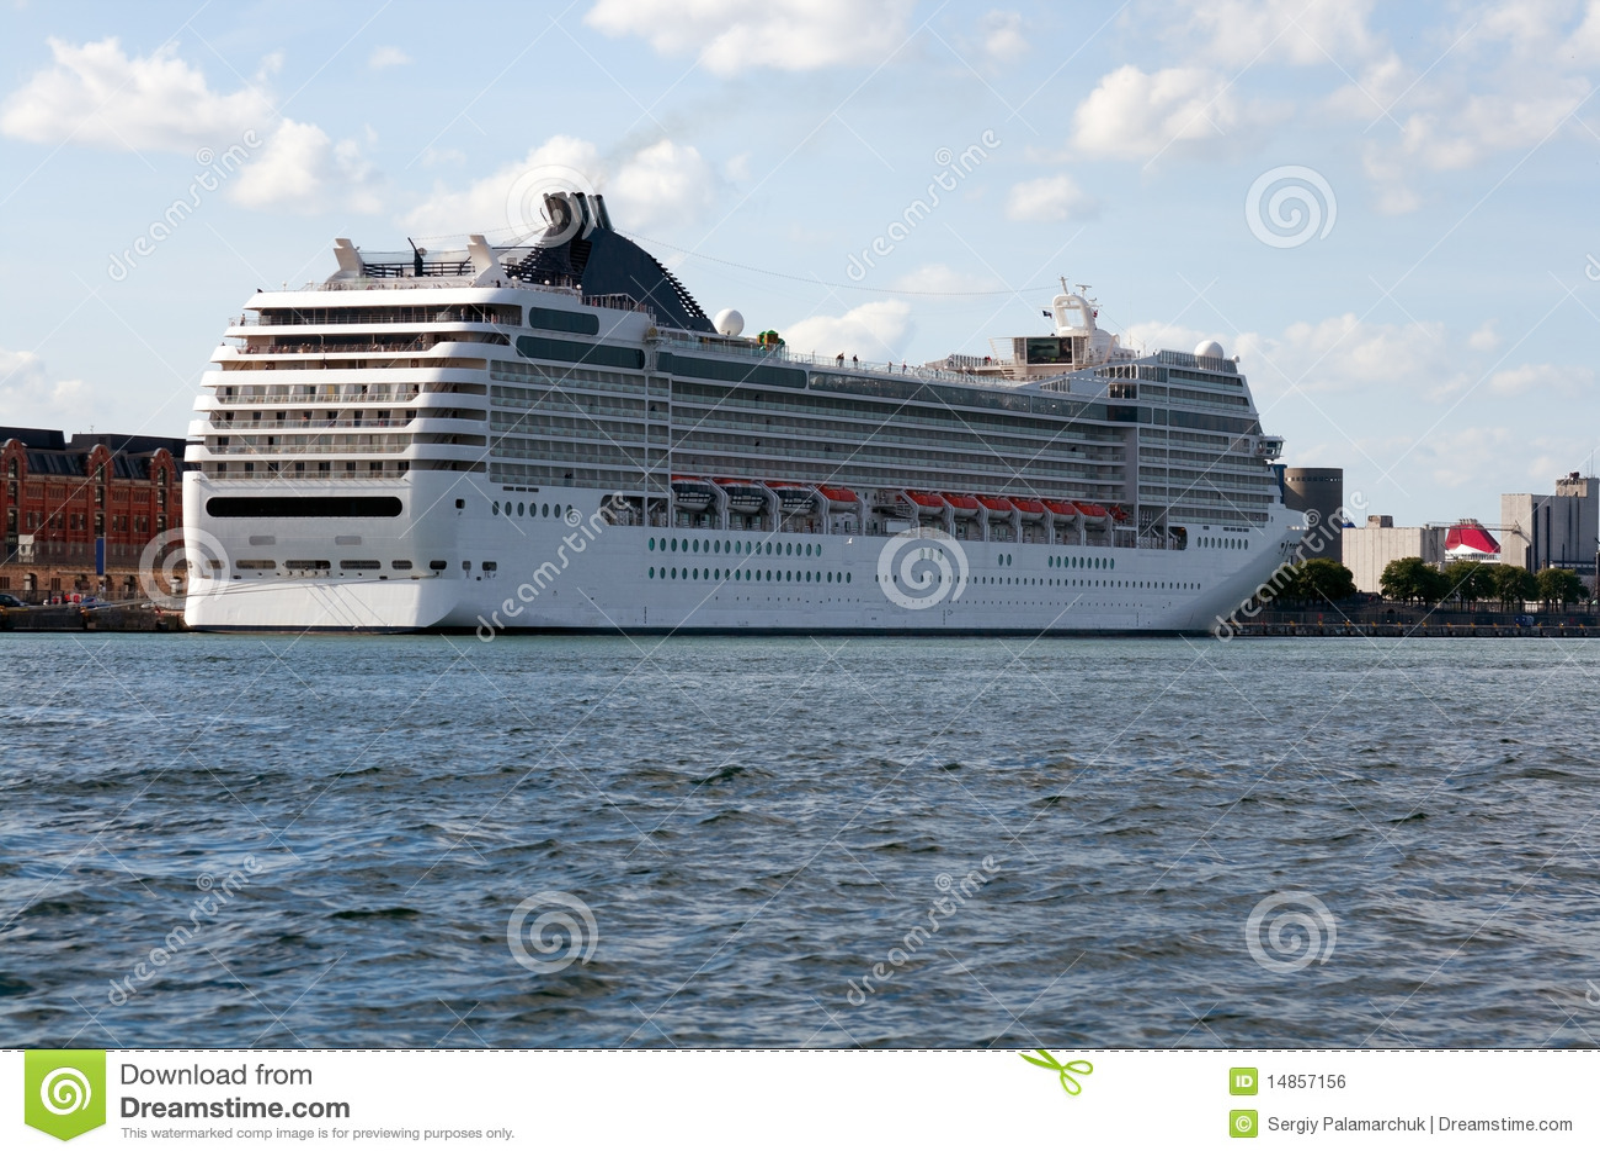 Royalty Free Stock Image Cruise Ship Stern Image 14857156